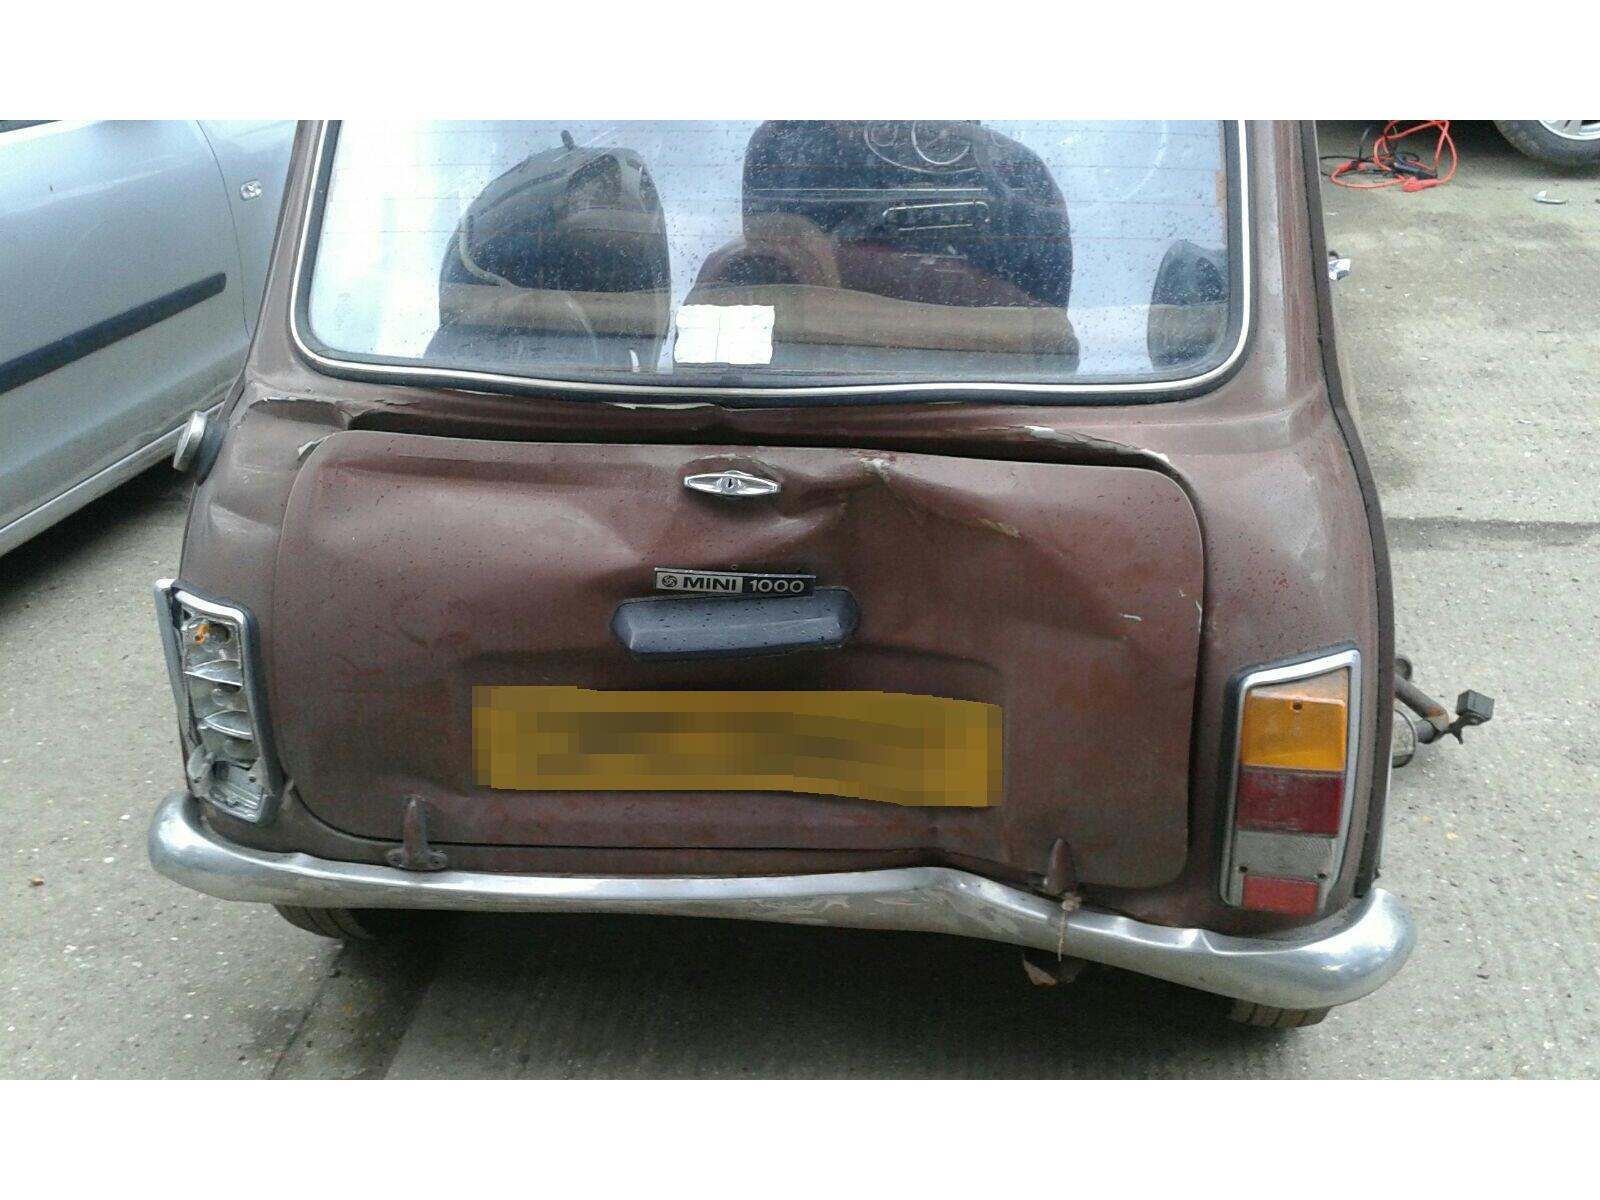 Austin Mini 1969 To 1980 Sun Visor RH (Petrol   Manual) for sale ... b0147270436